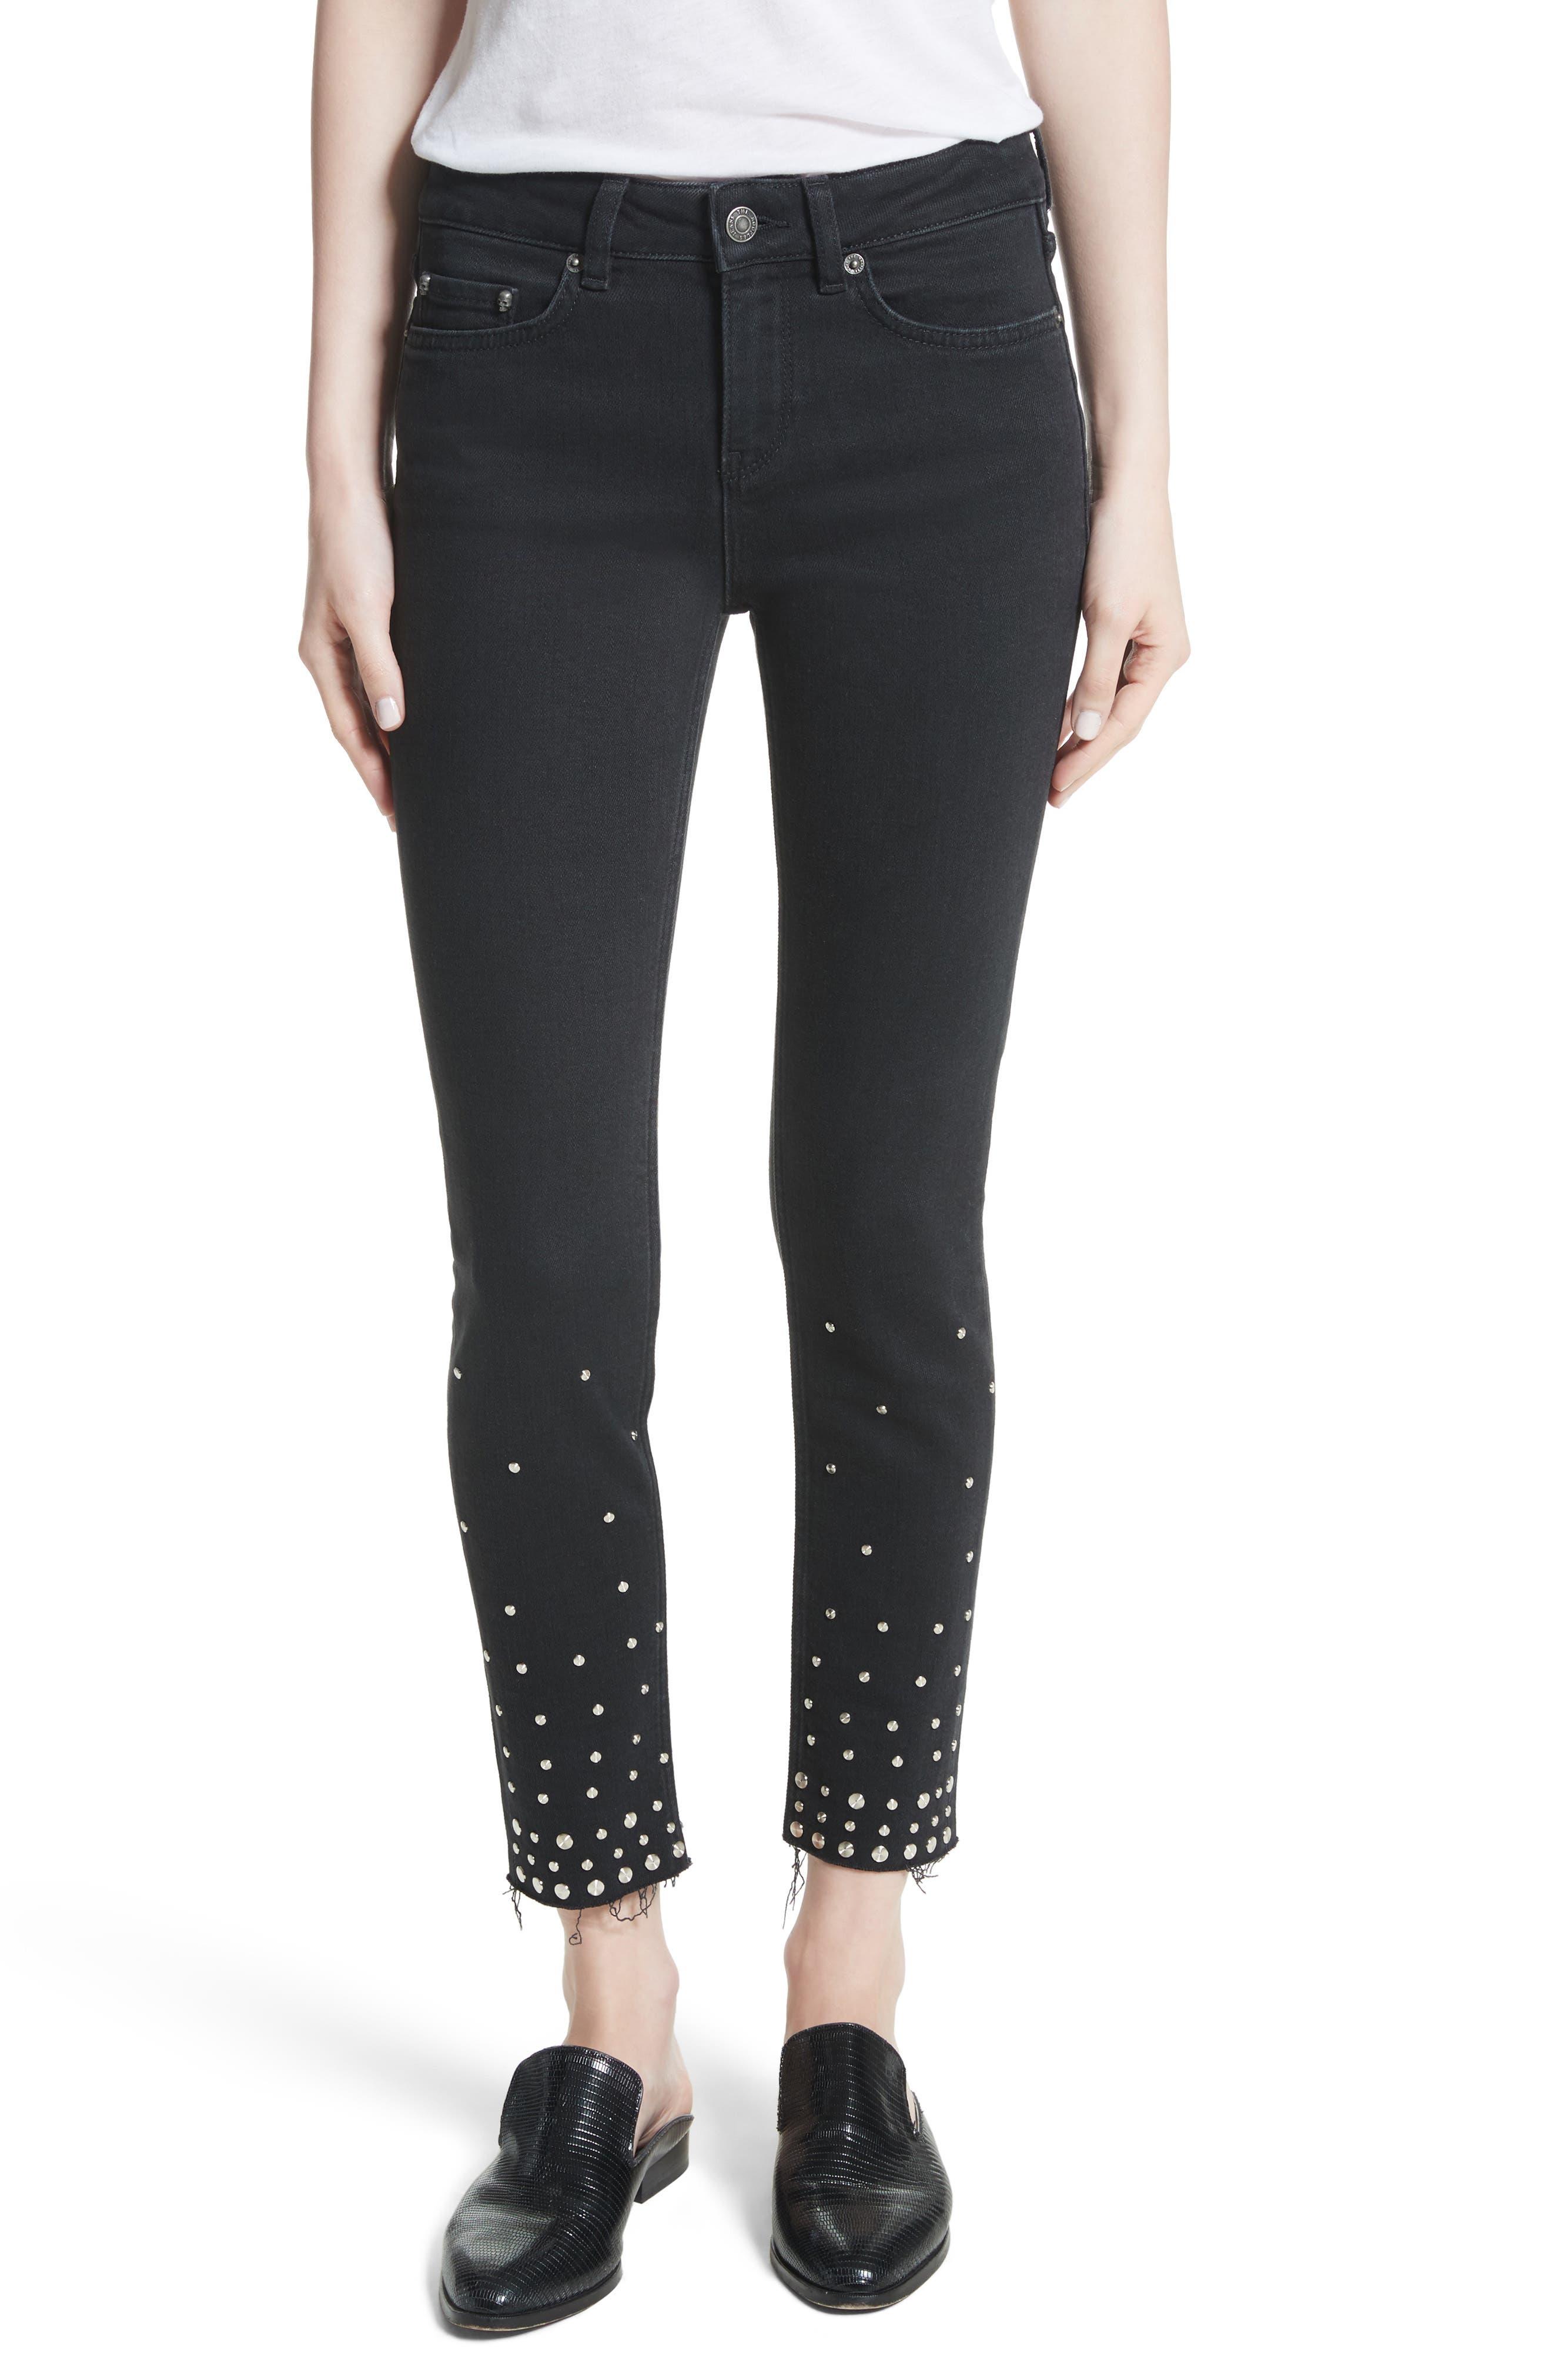 The Kooples Studded Crop Skinny Jeans